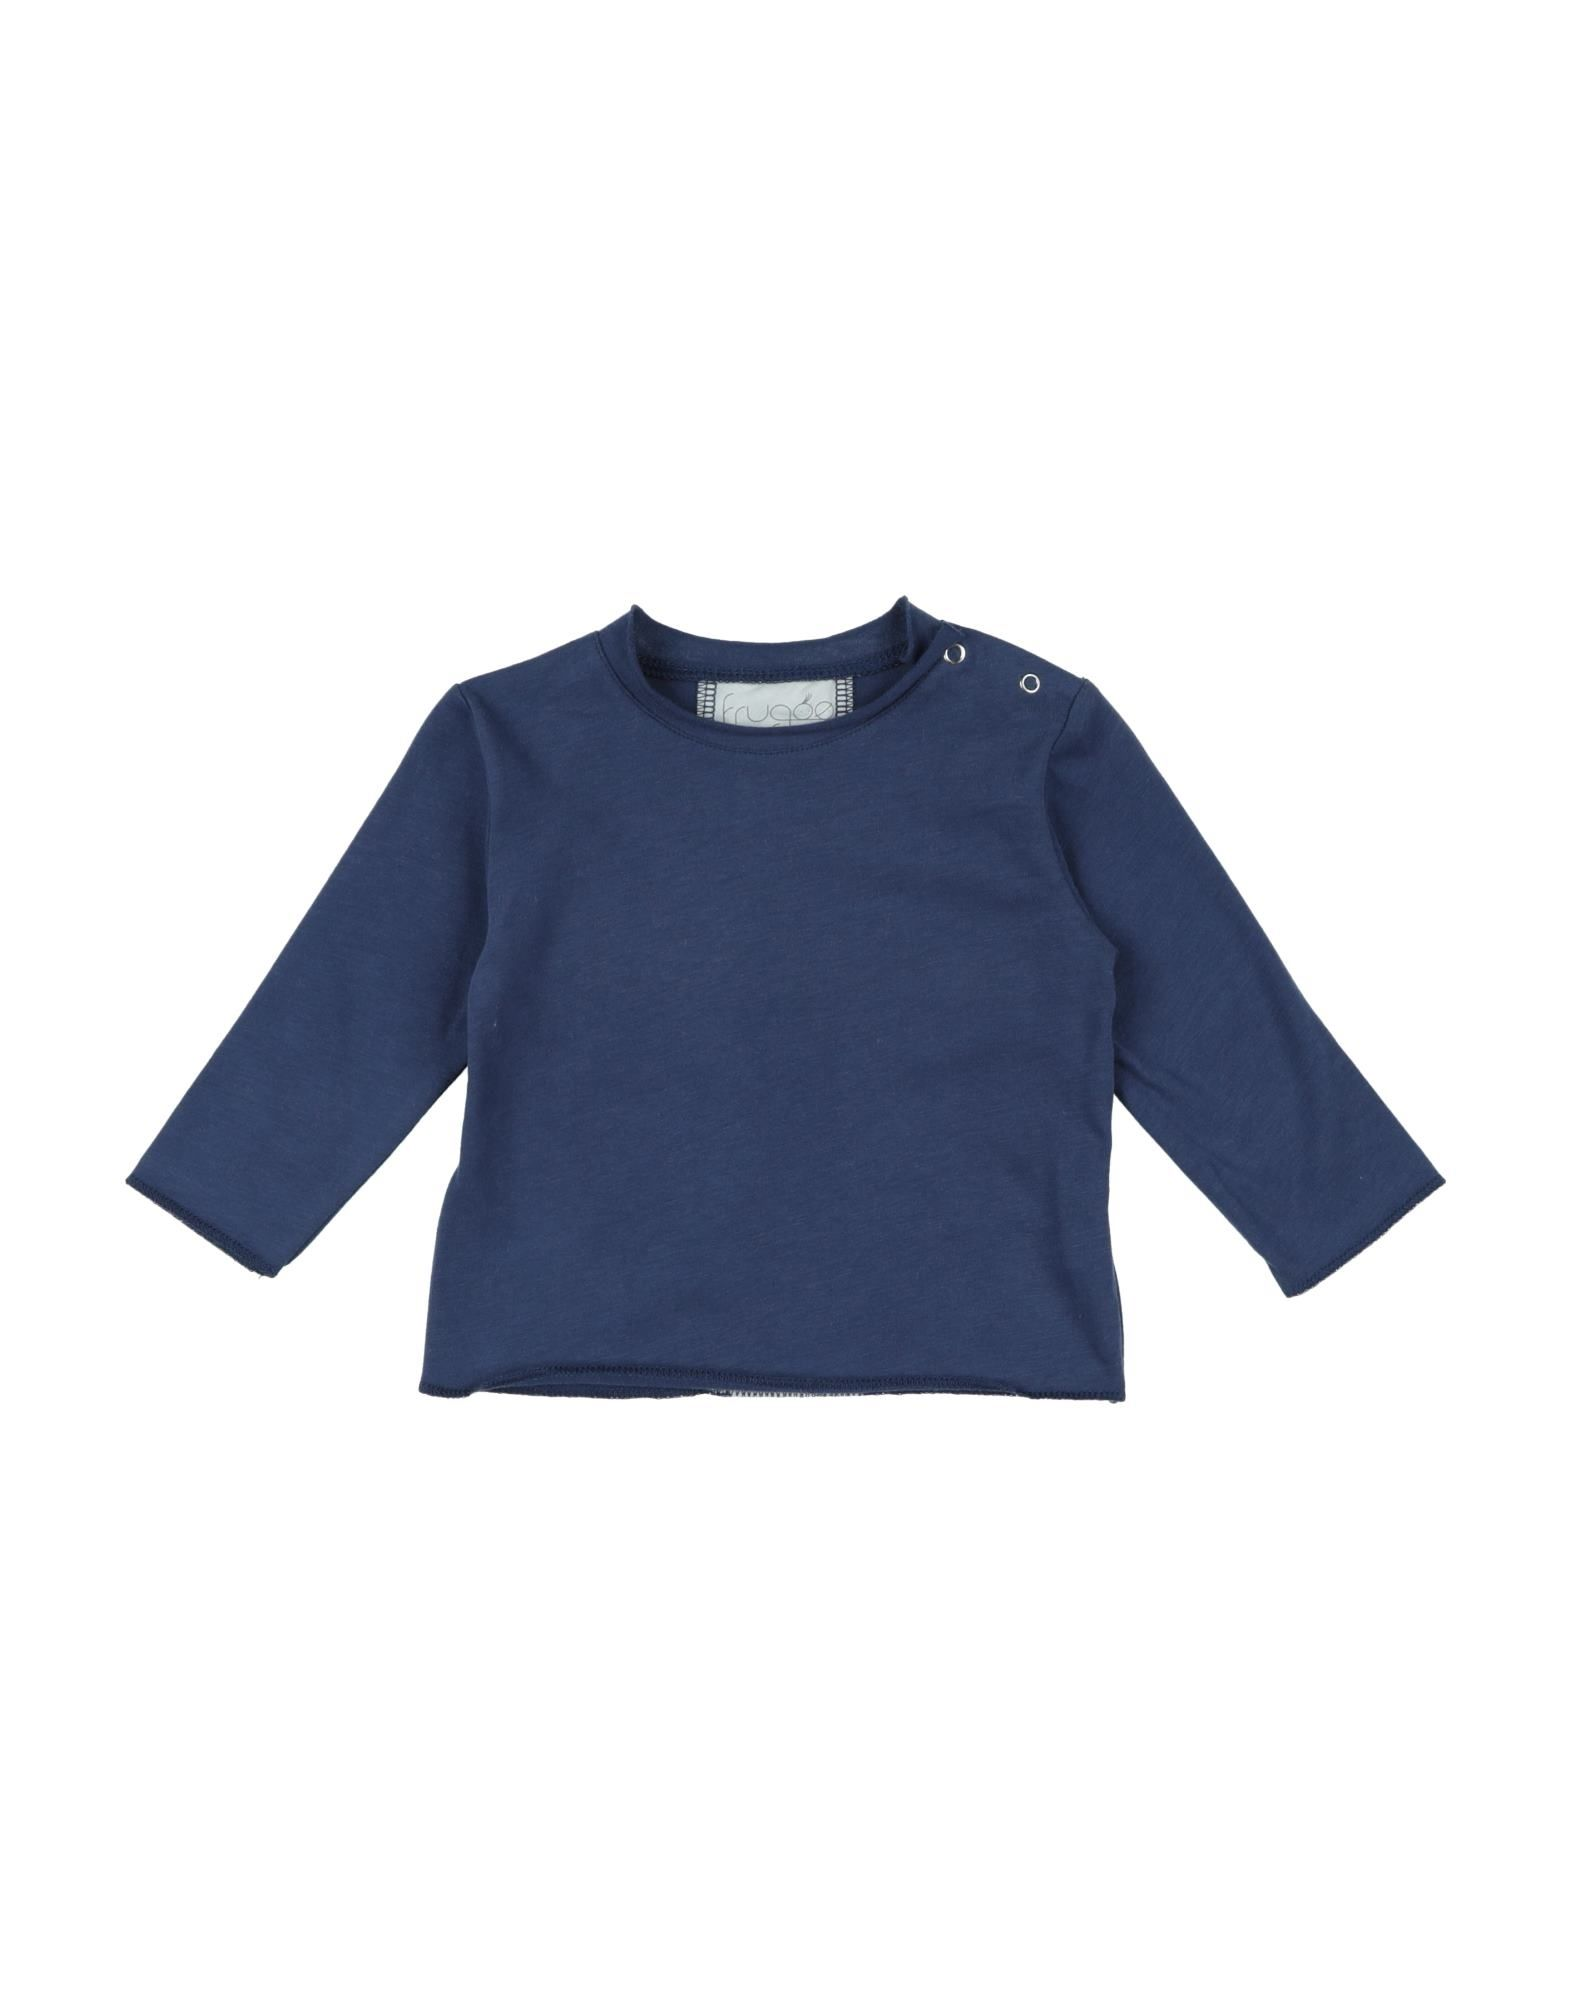 Frugoo Kids' T-shirts In Blue